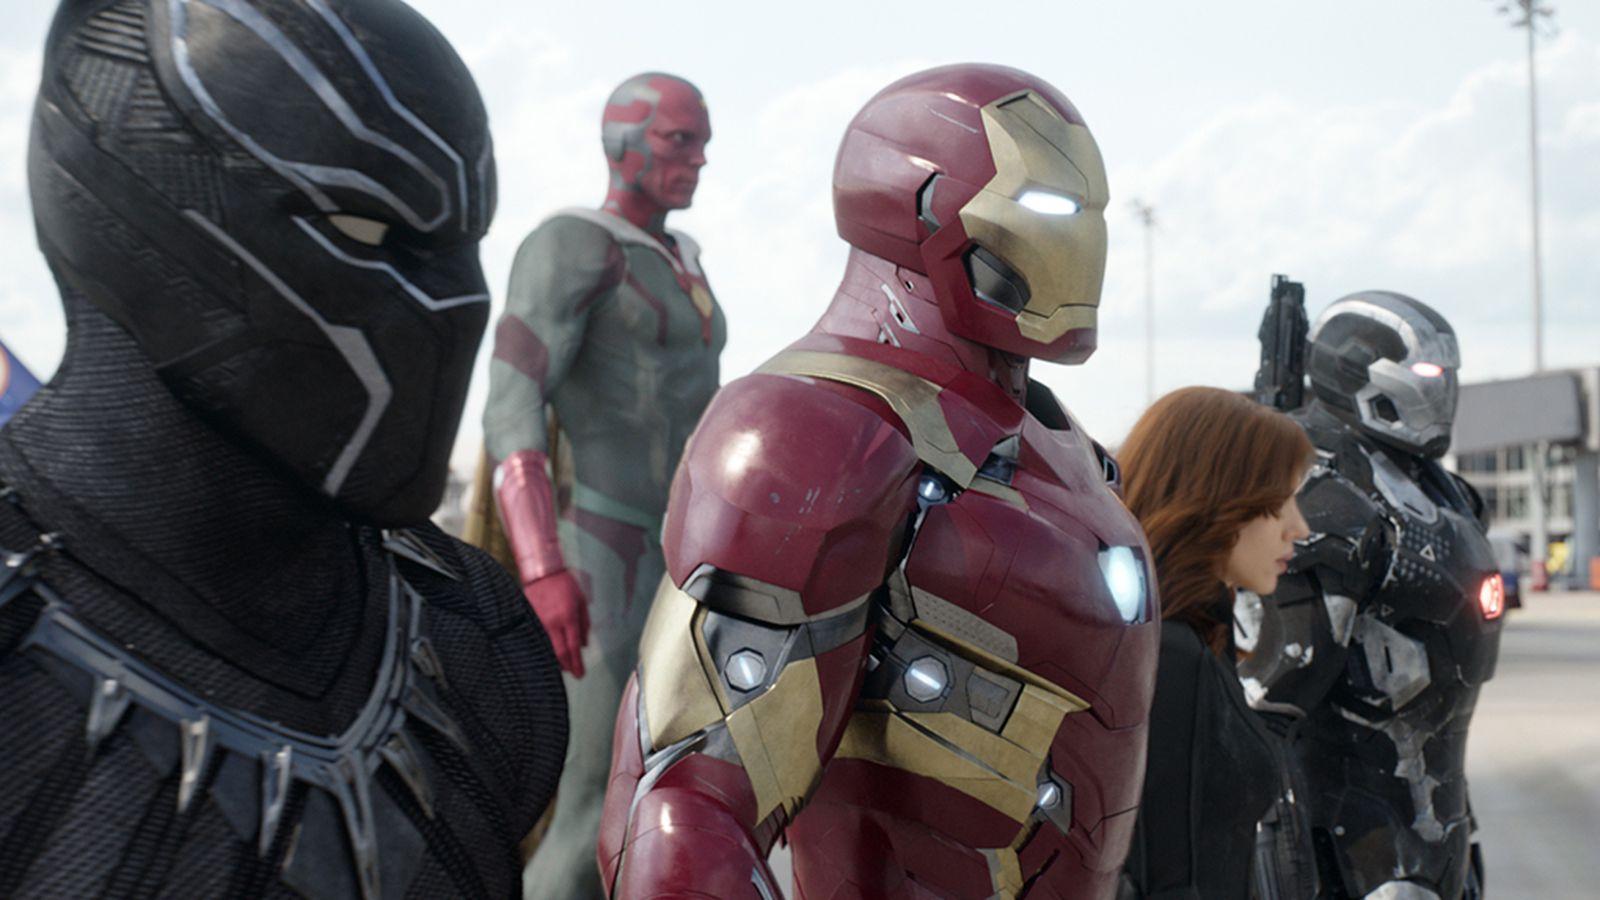 That massive airport fight in Captain America: Civil War was almost